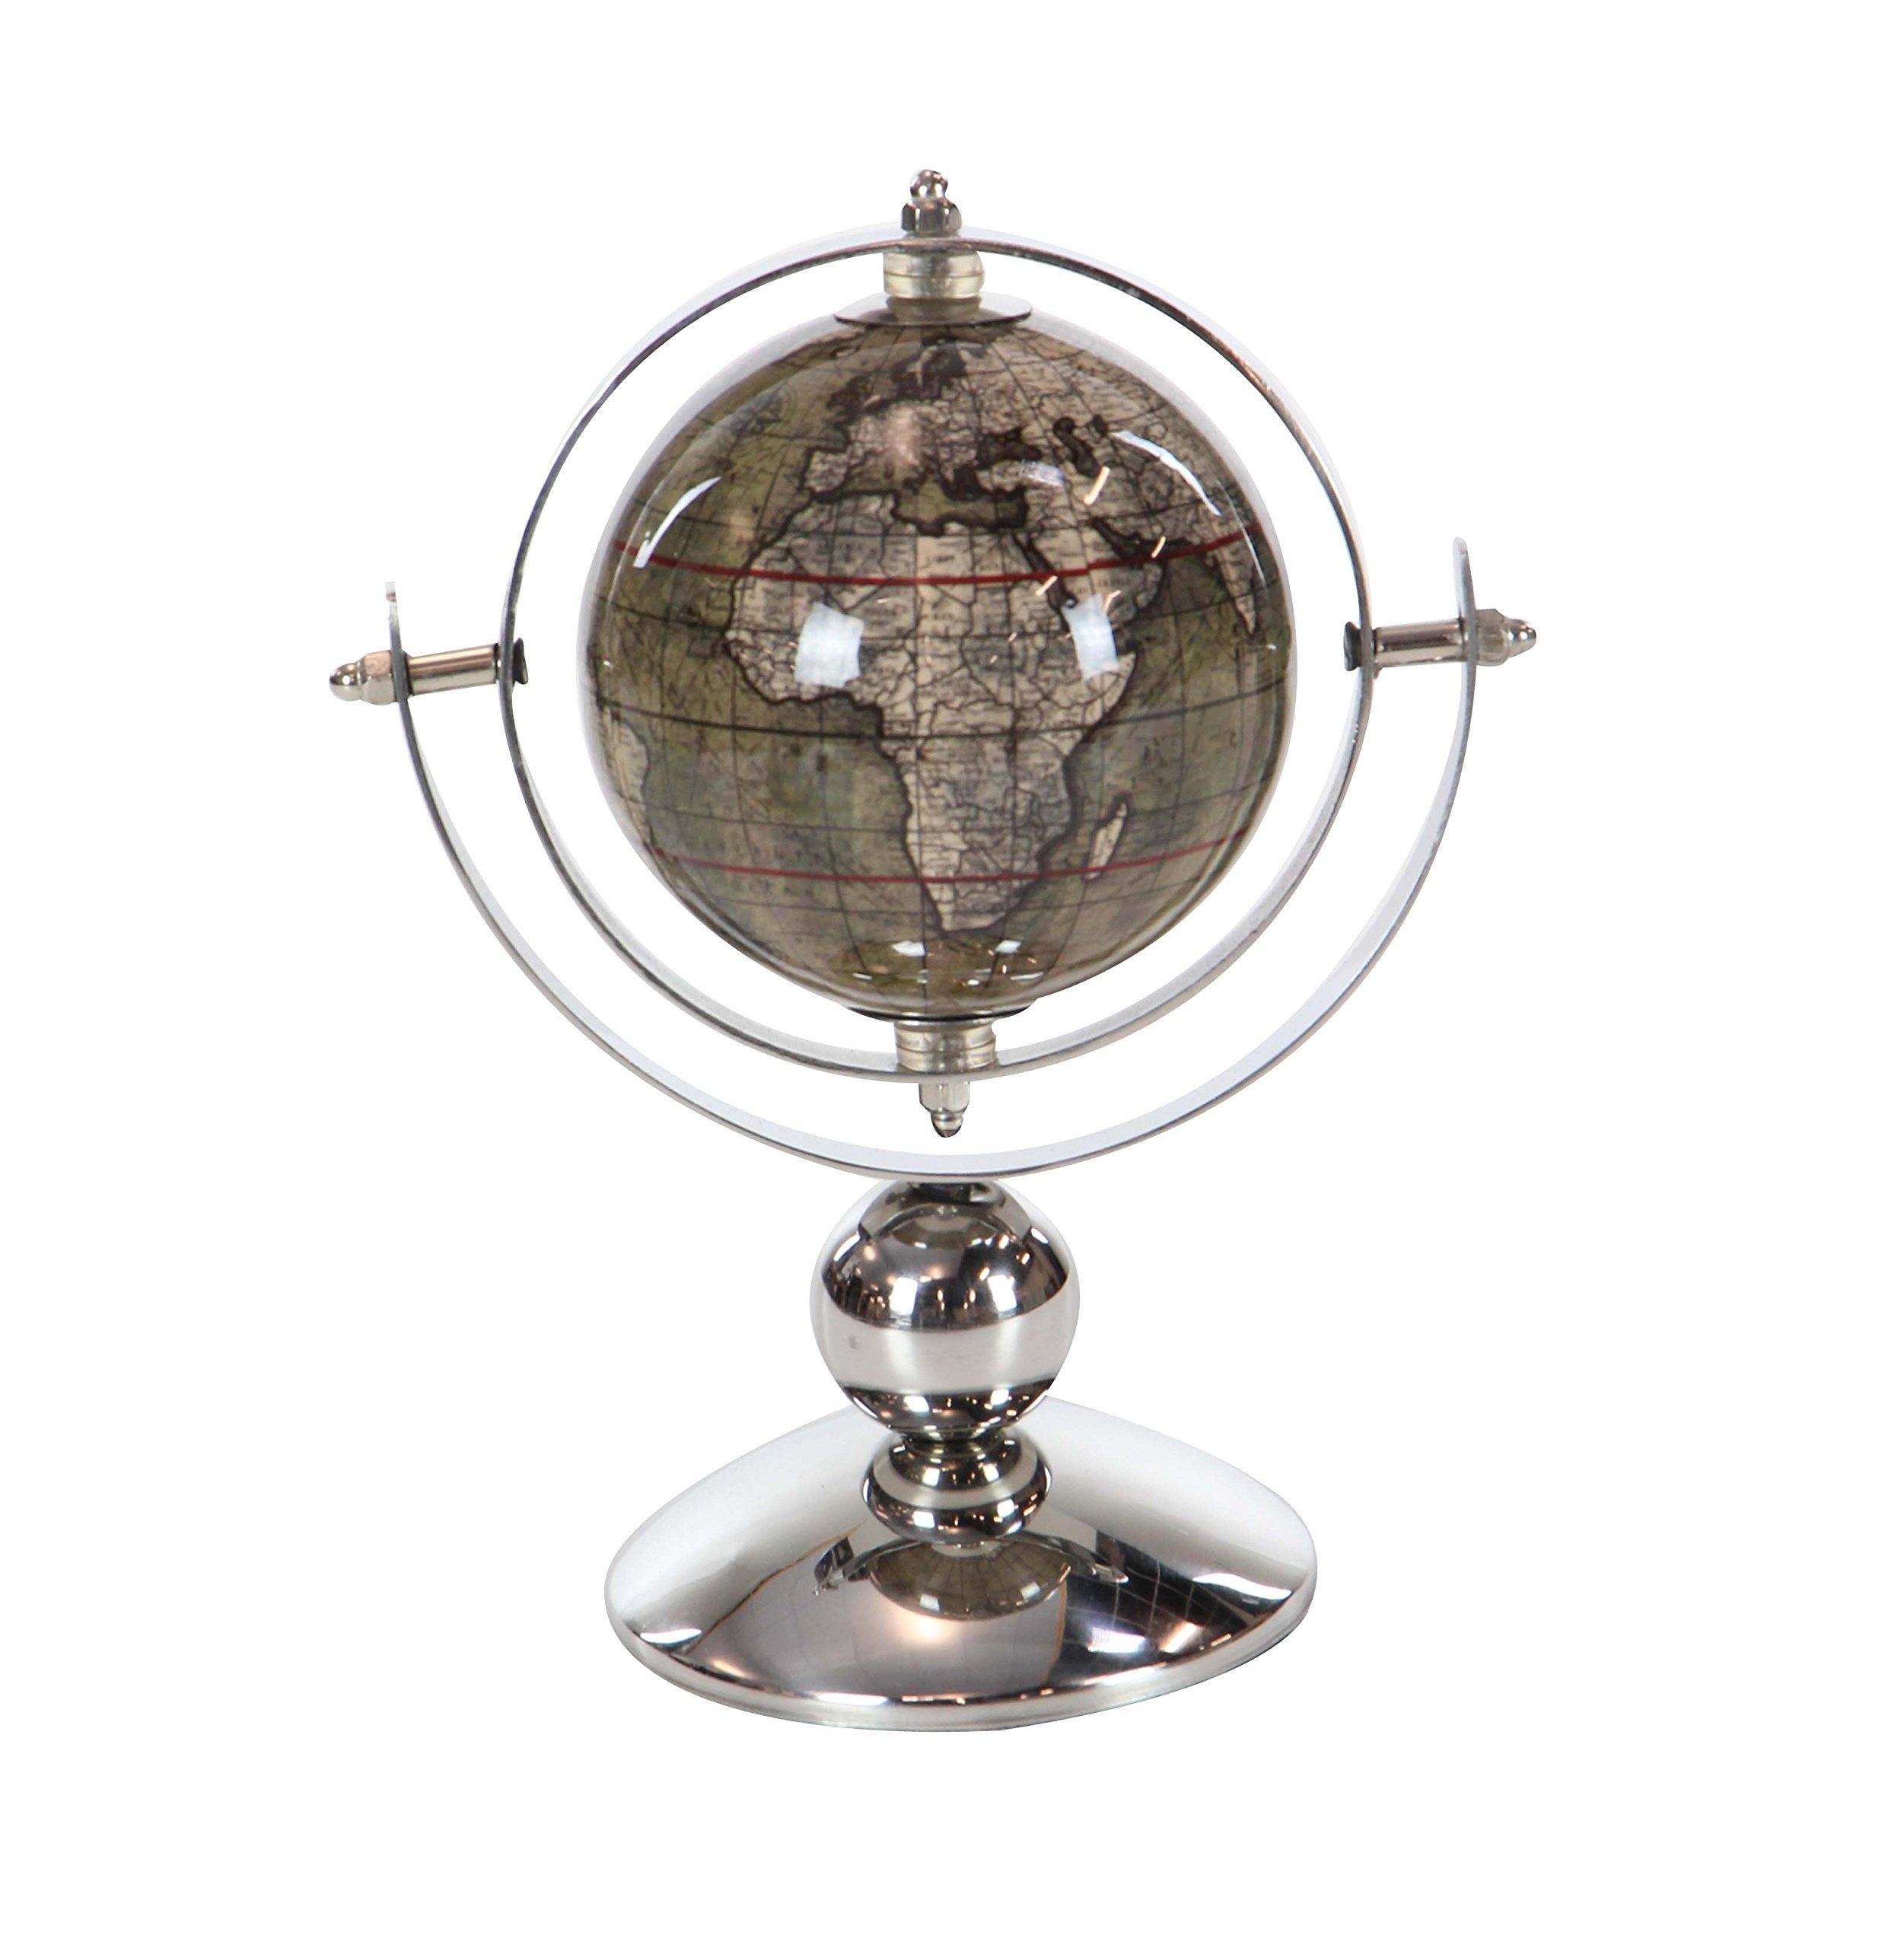 Deco 79 43488 Polished Silver Decorative Globe, 9'' x 6'', Brown/White